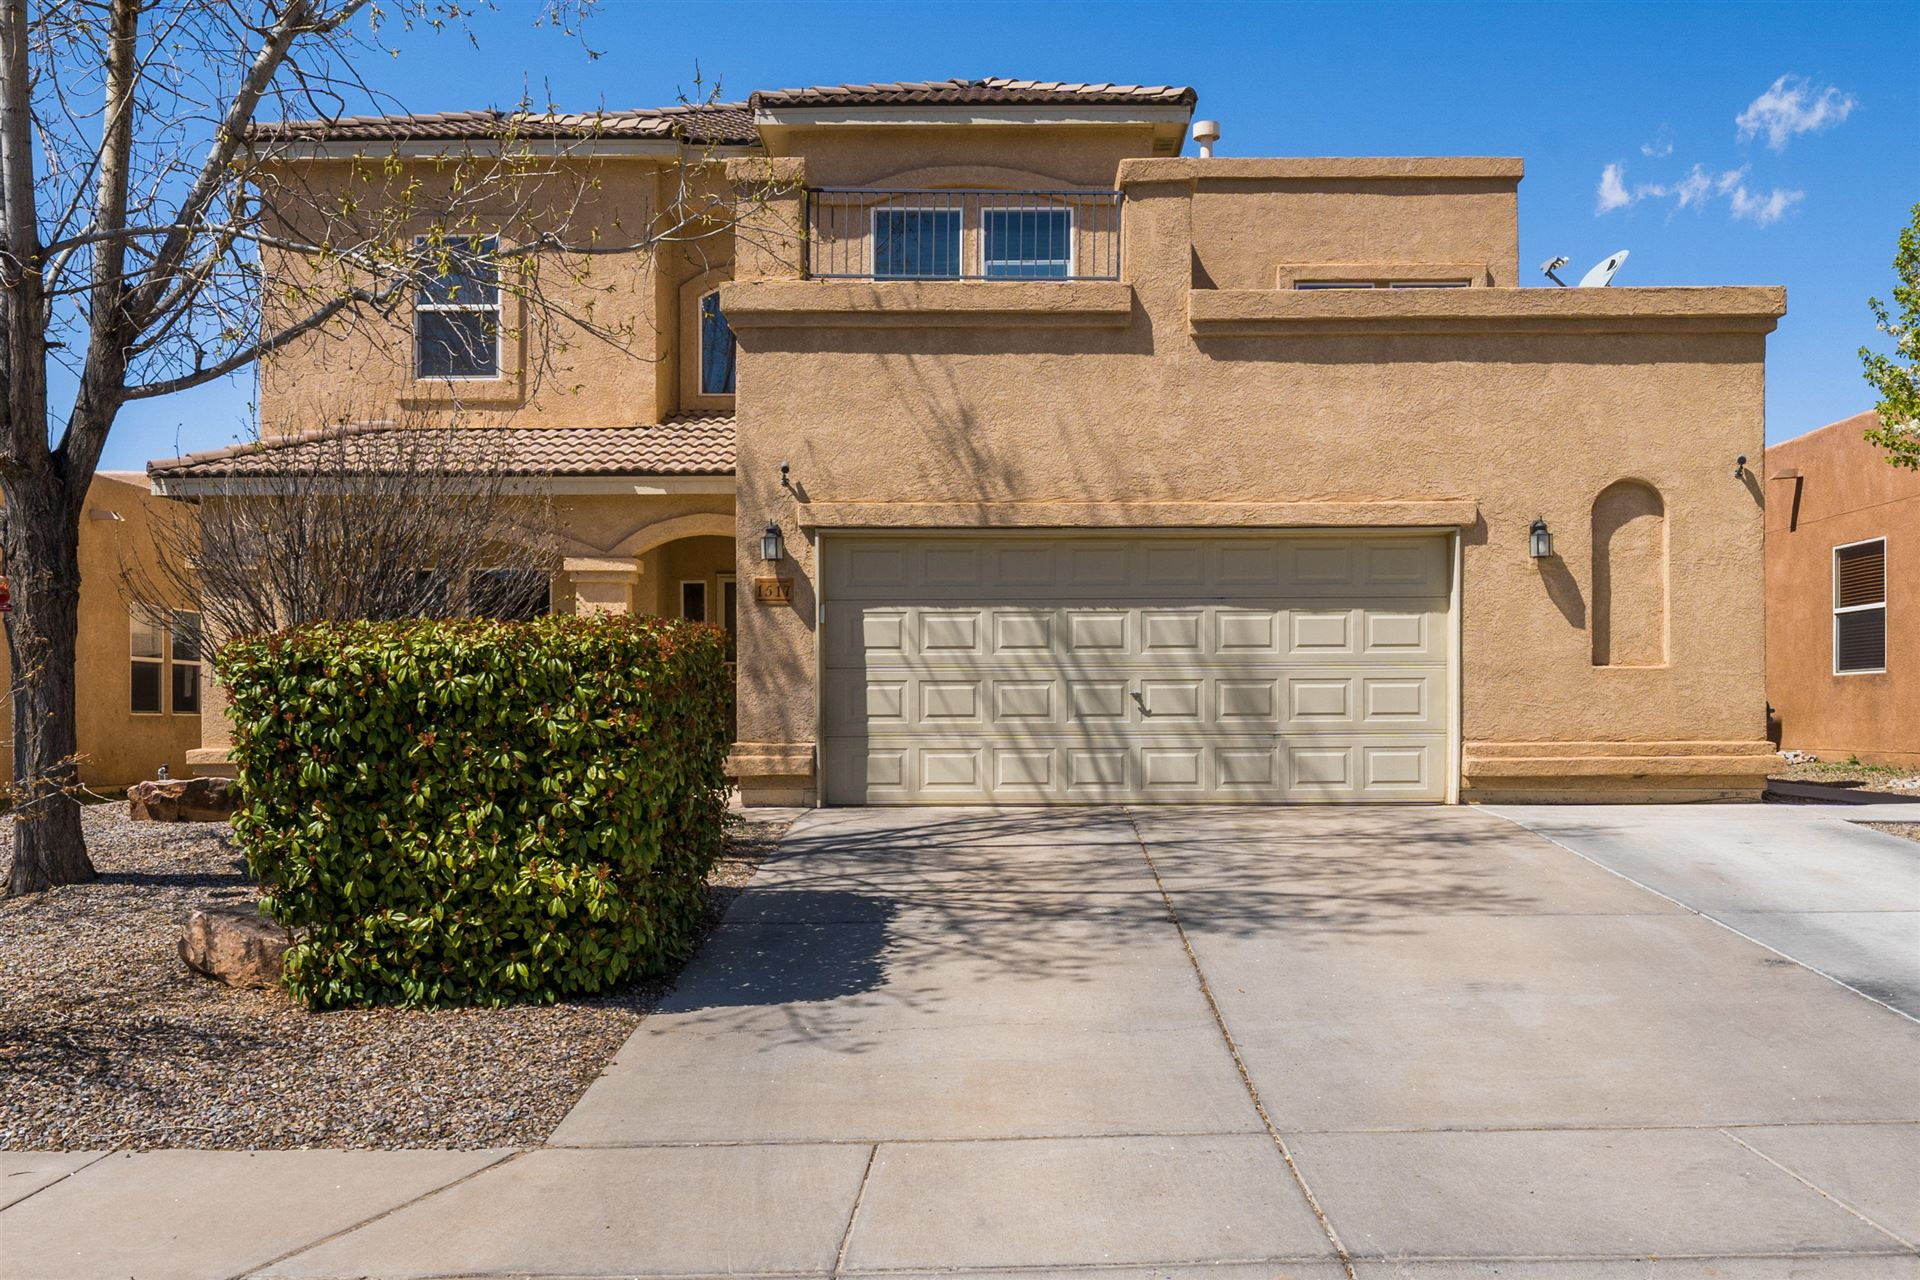 1517 VIA VERANE Drive SE, Rio Rancho, NM 87124 - MLS#: 988769